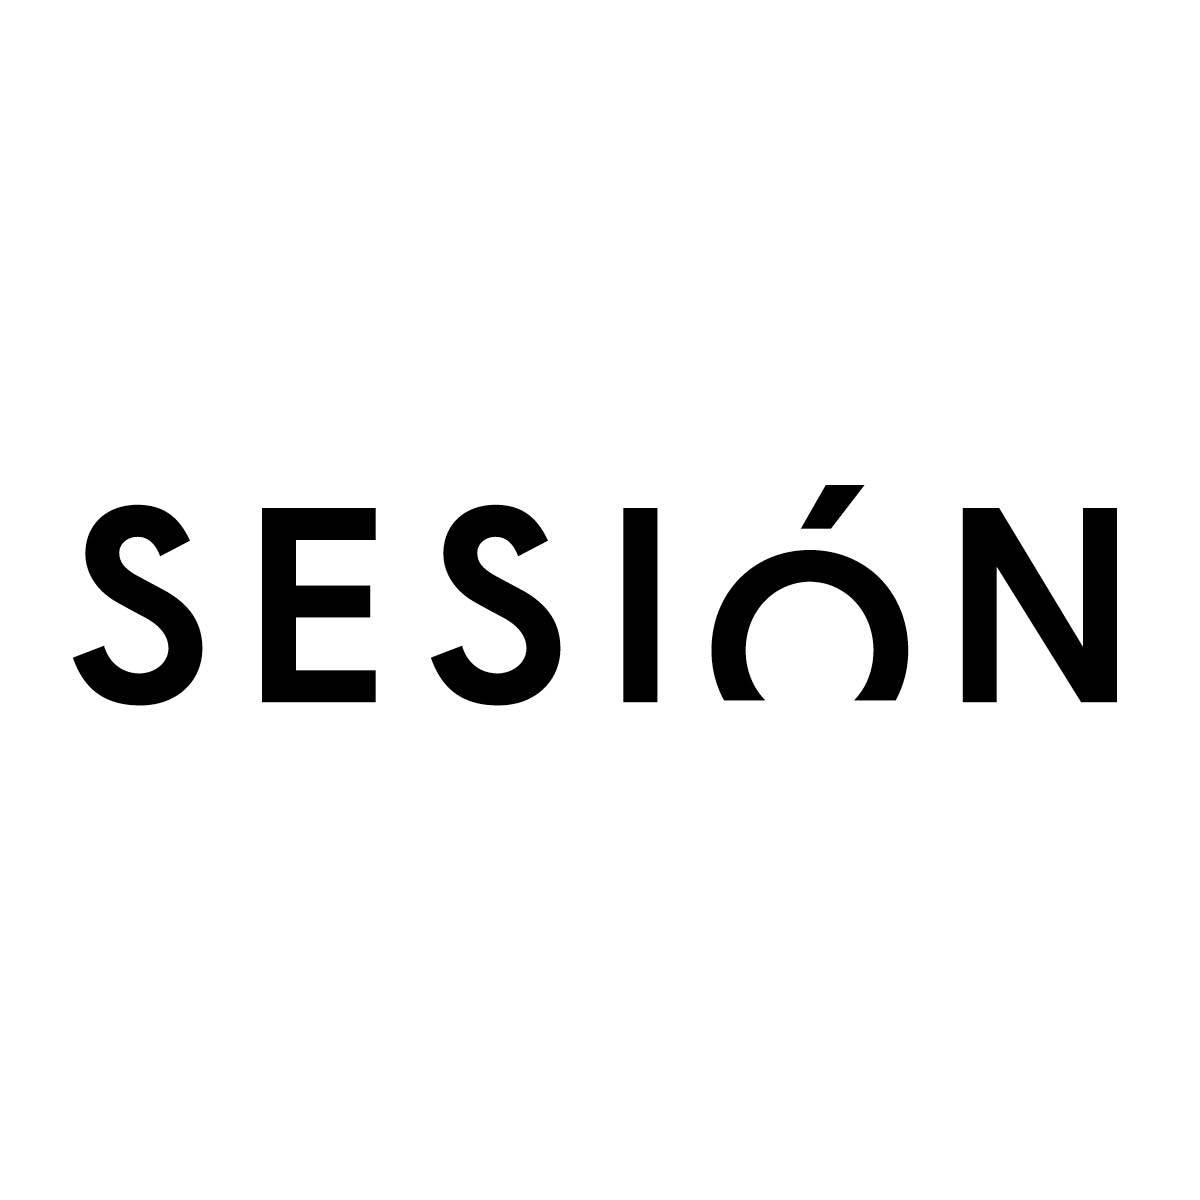 Sesion